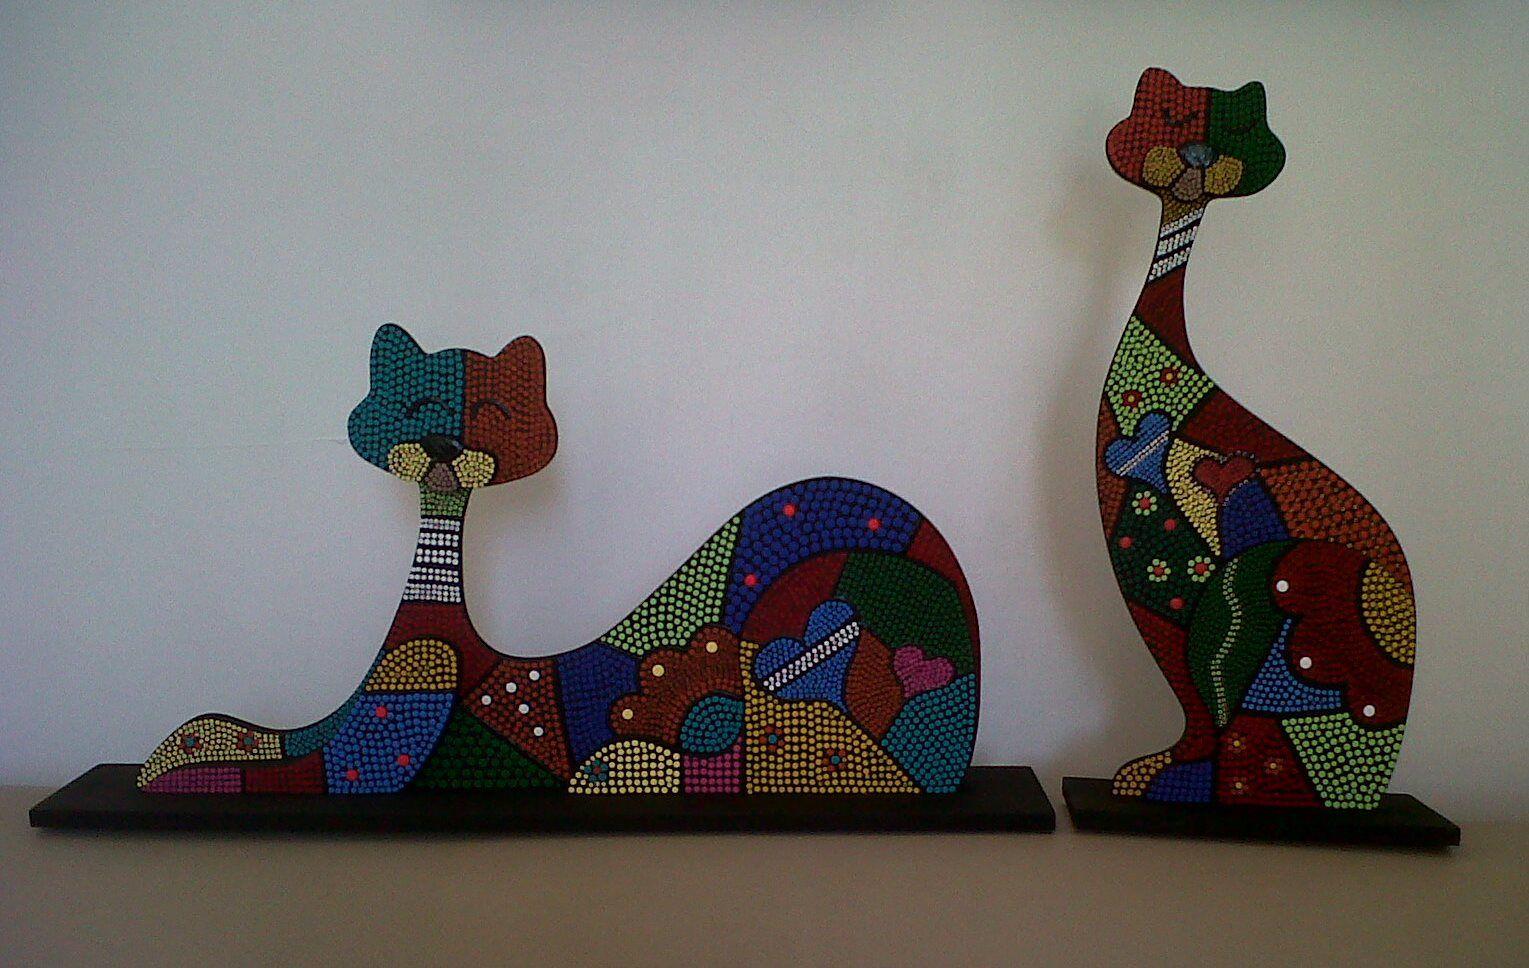 cats in pointillism / Gatos en puntillismo